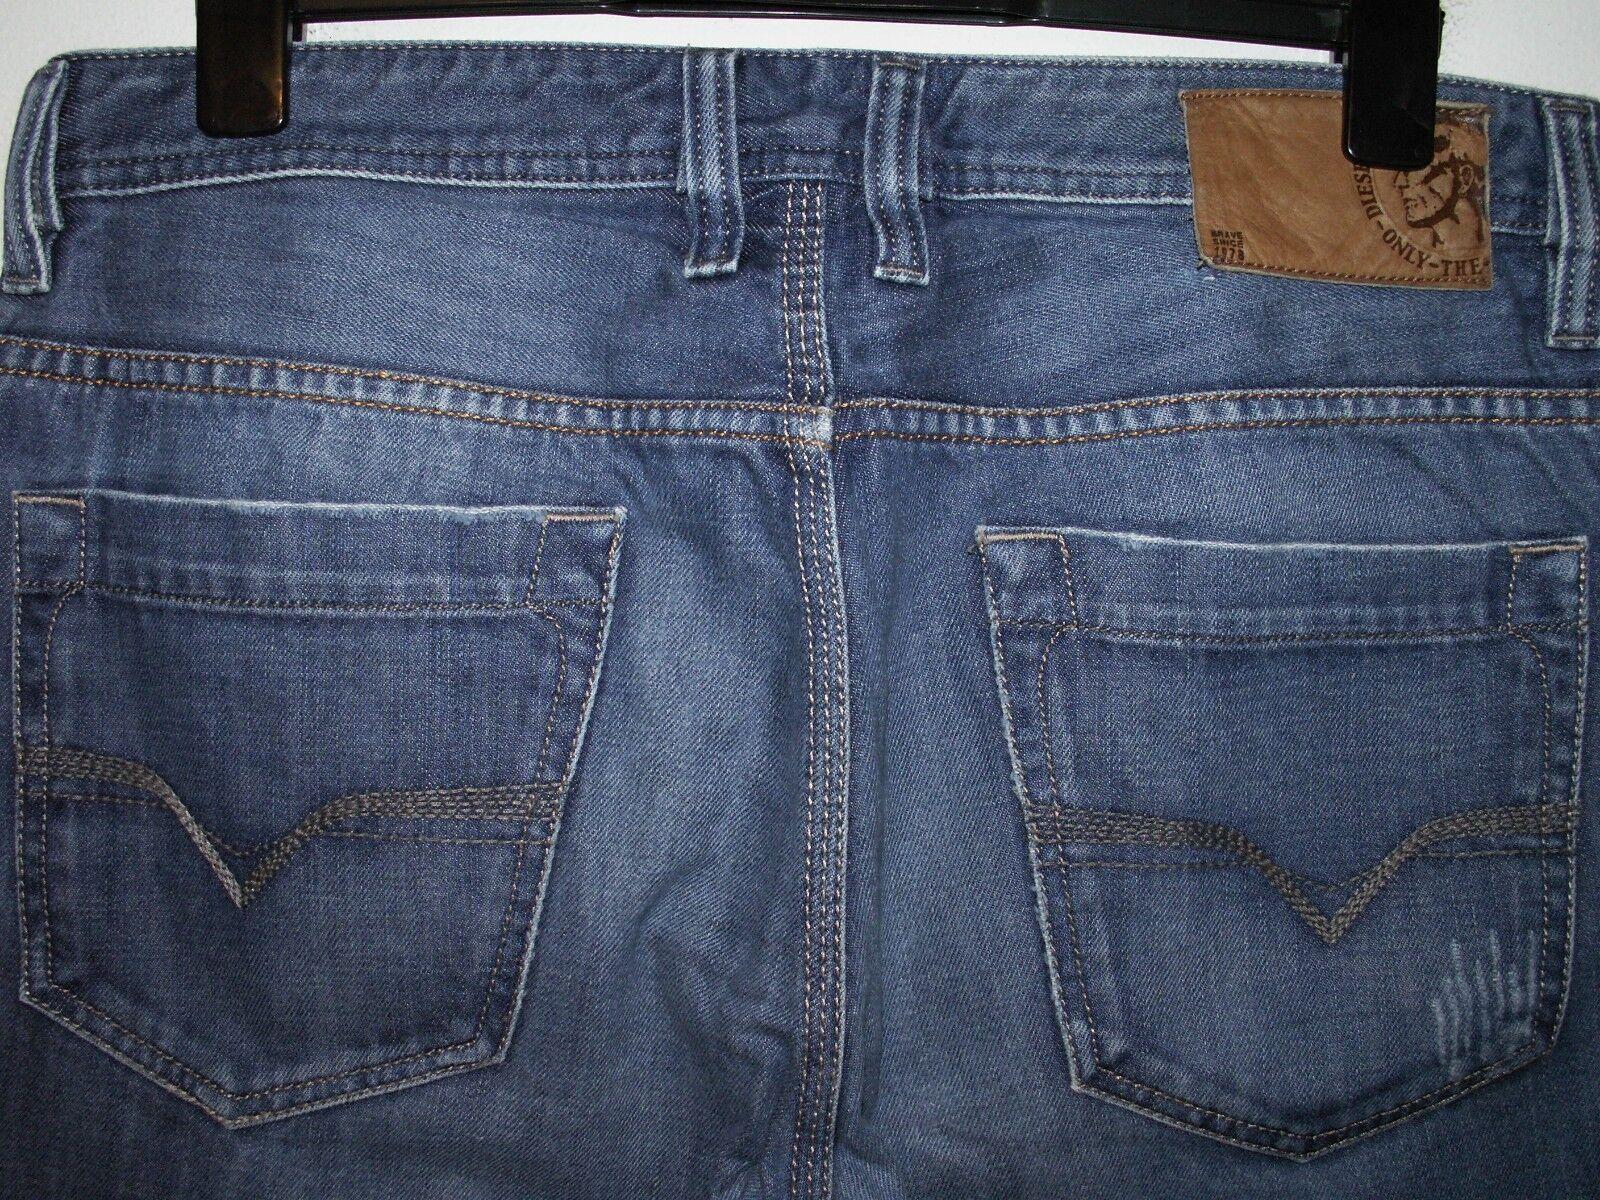 Diesel koffha bootcut jeans wash 008BK W34 L32 (a637)